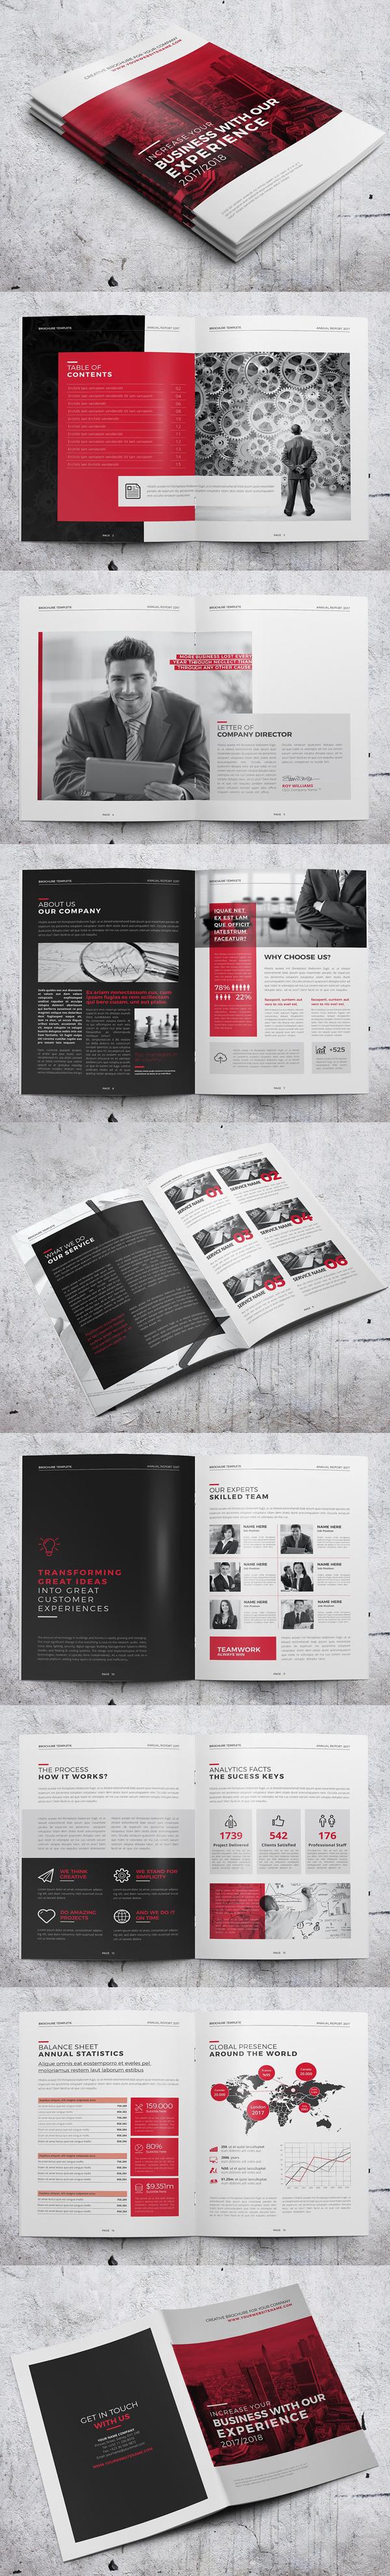 Corporate Clean Brochure / Annual Report Design